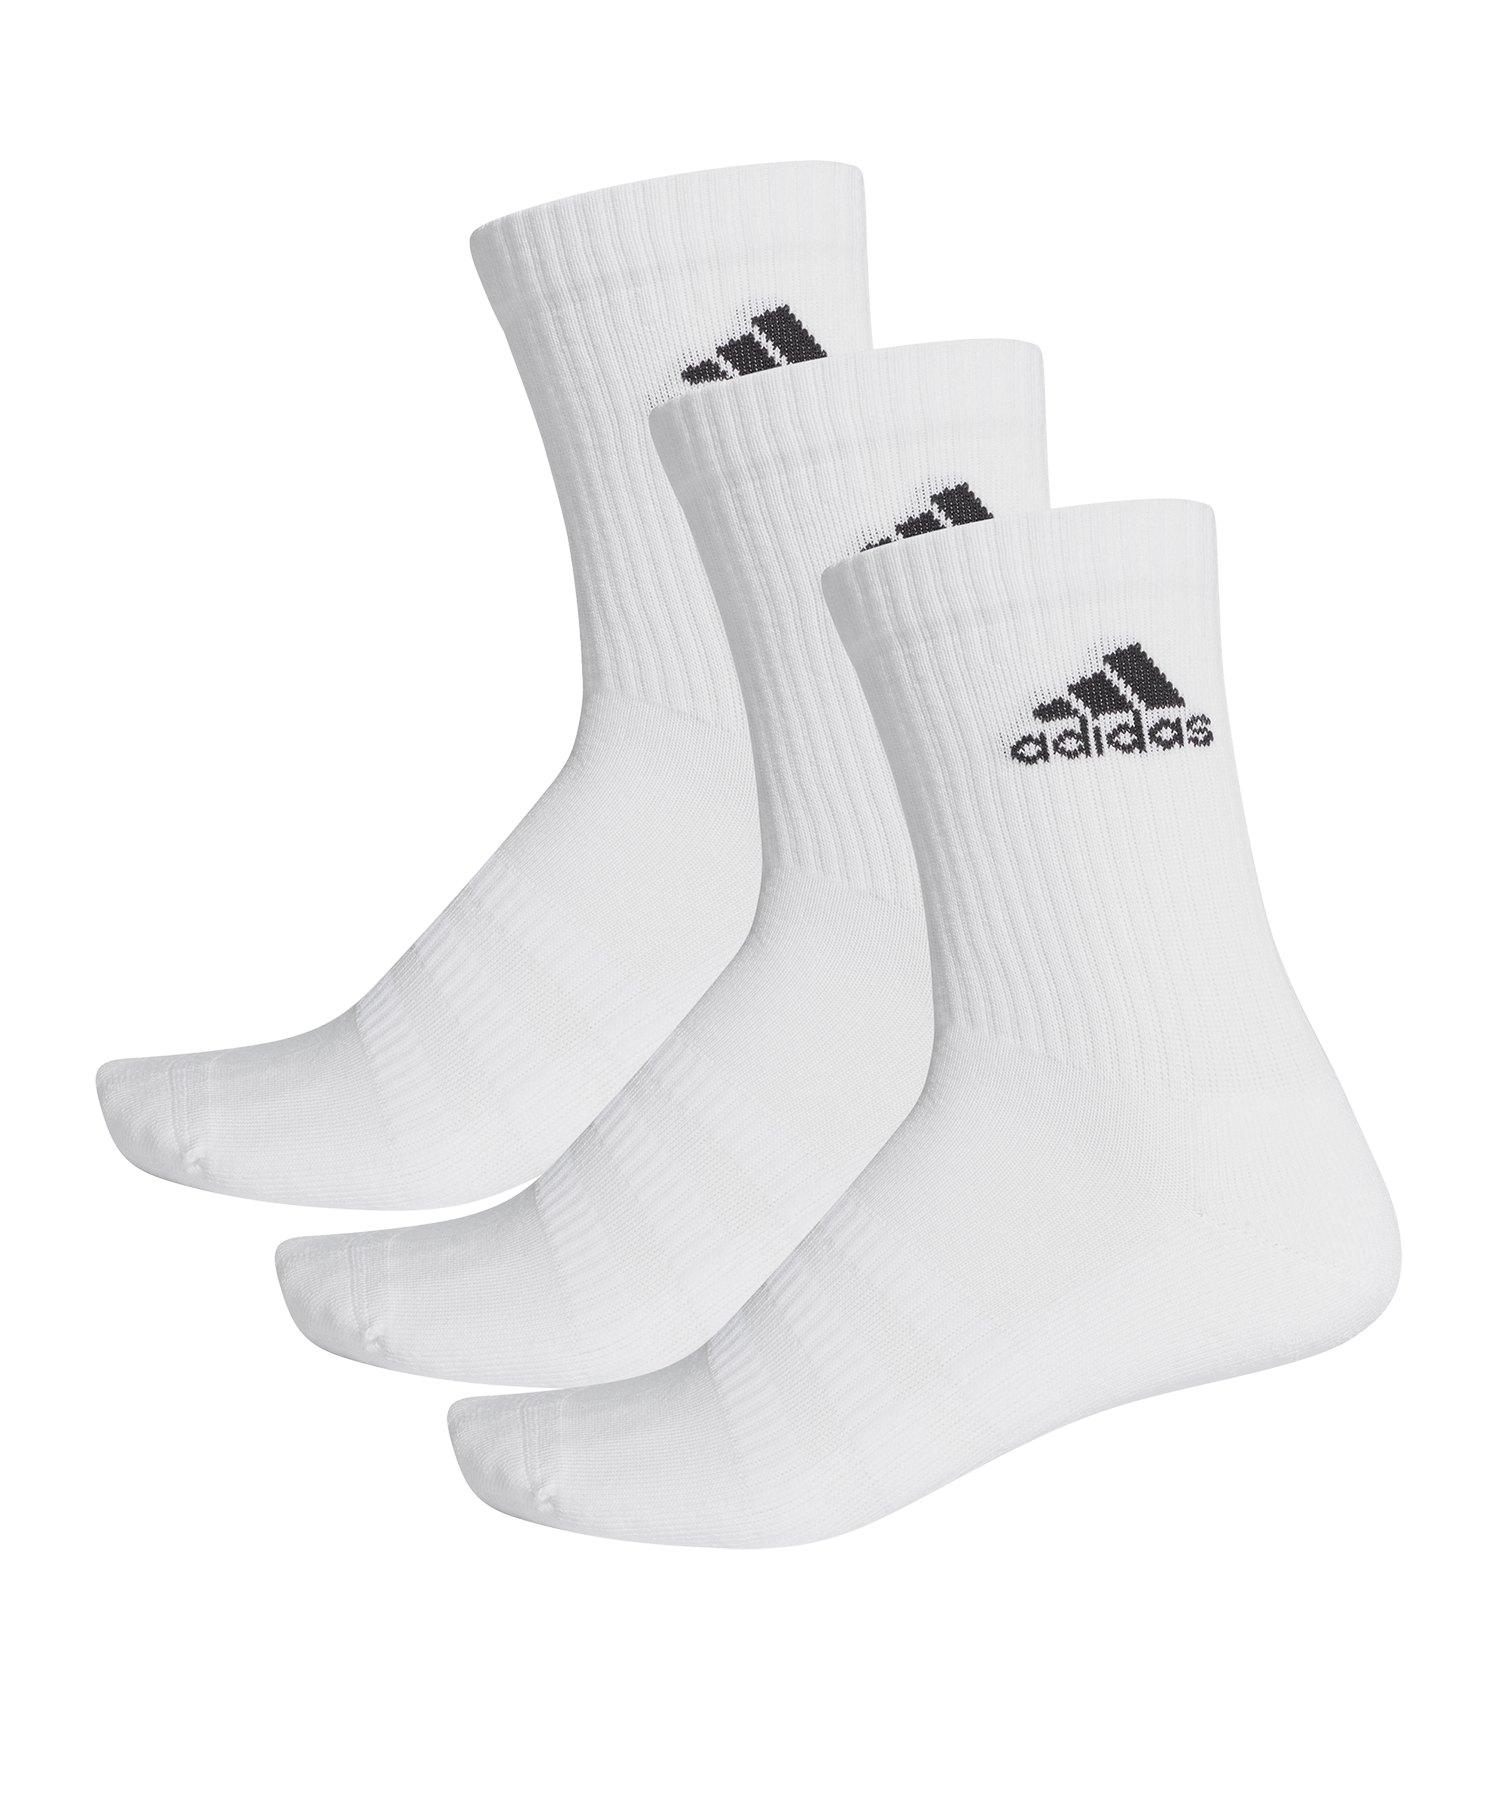 adidas modell milano 16 sock gr 43-45 in weiß